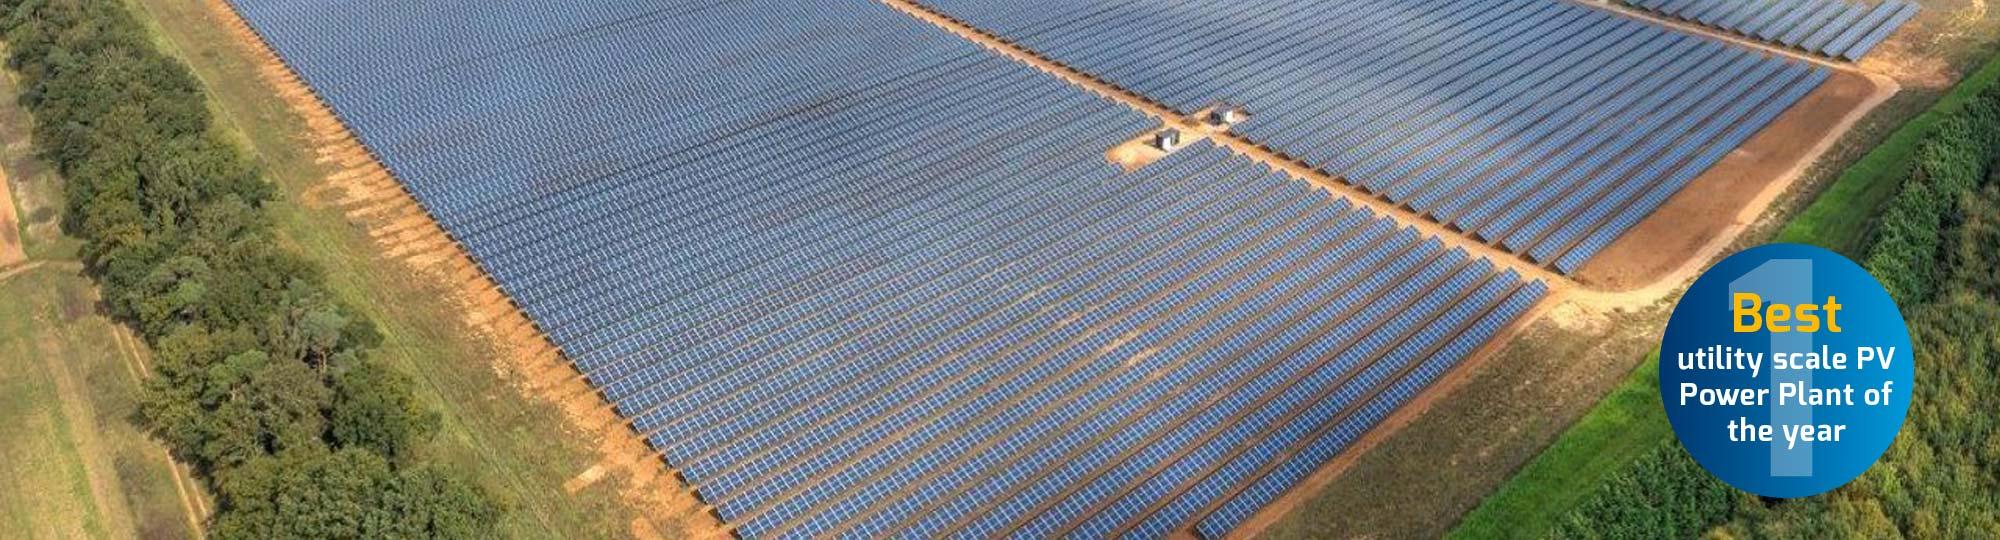 solarnet energy network